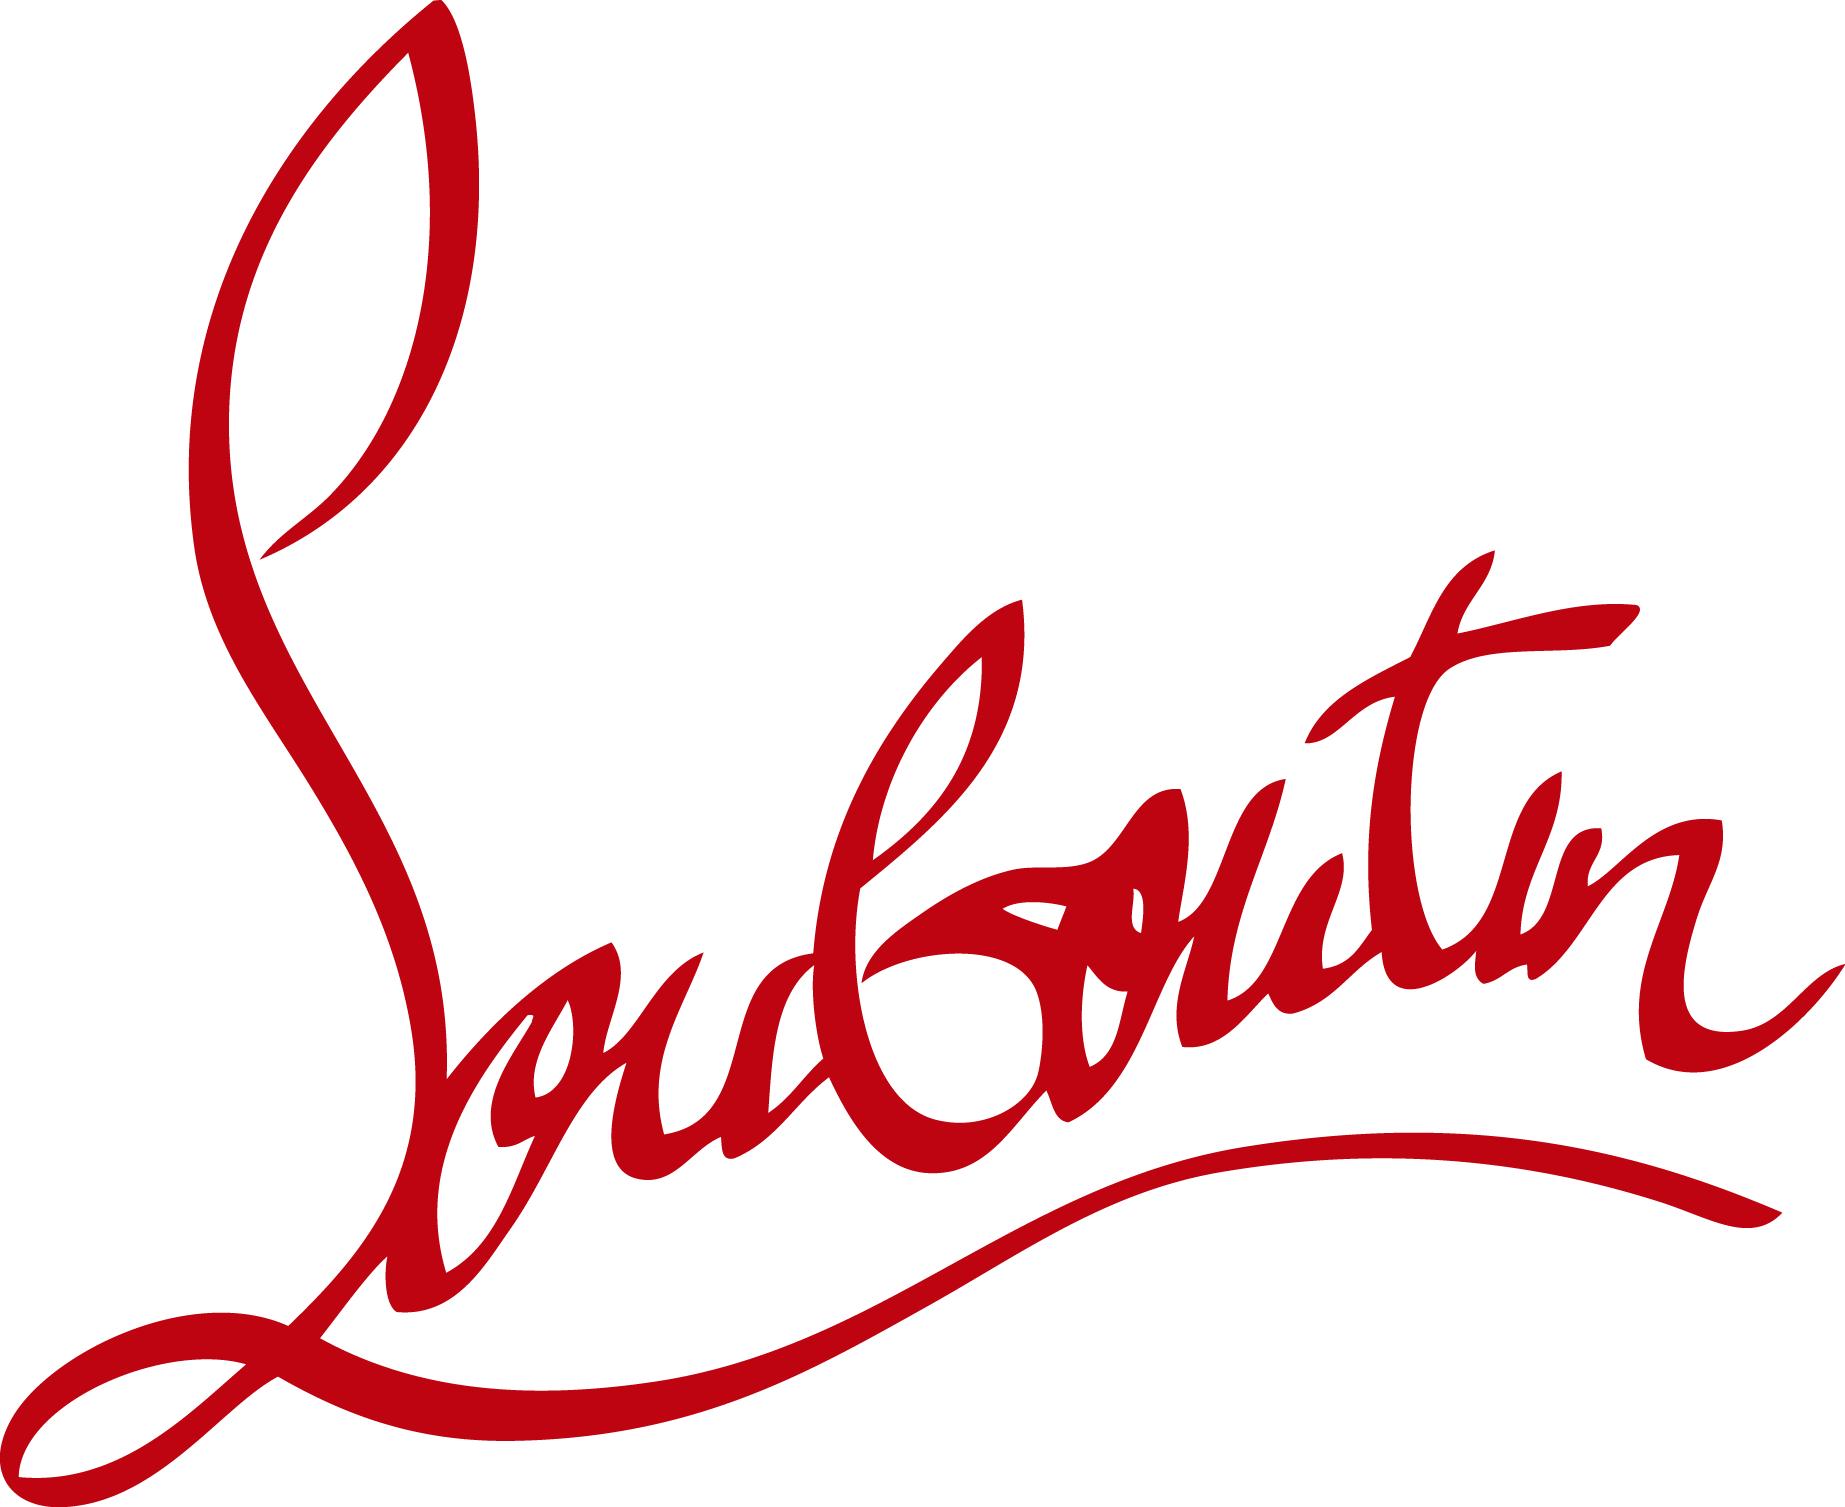 Christian louboutin Logos.